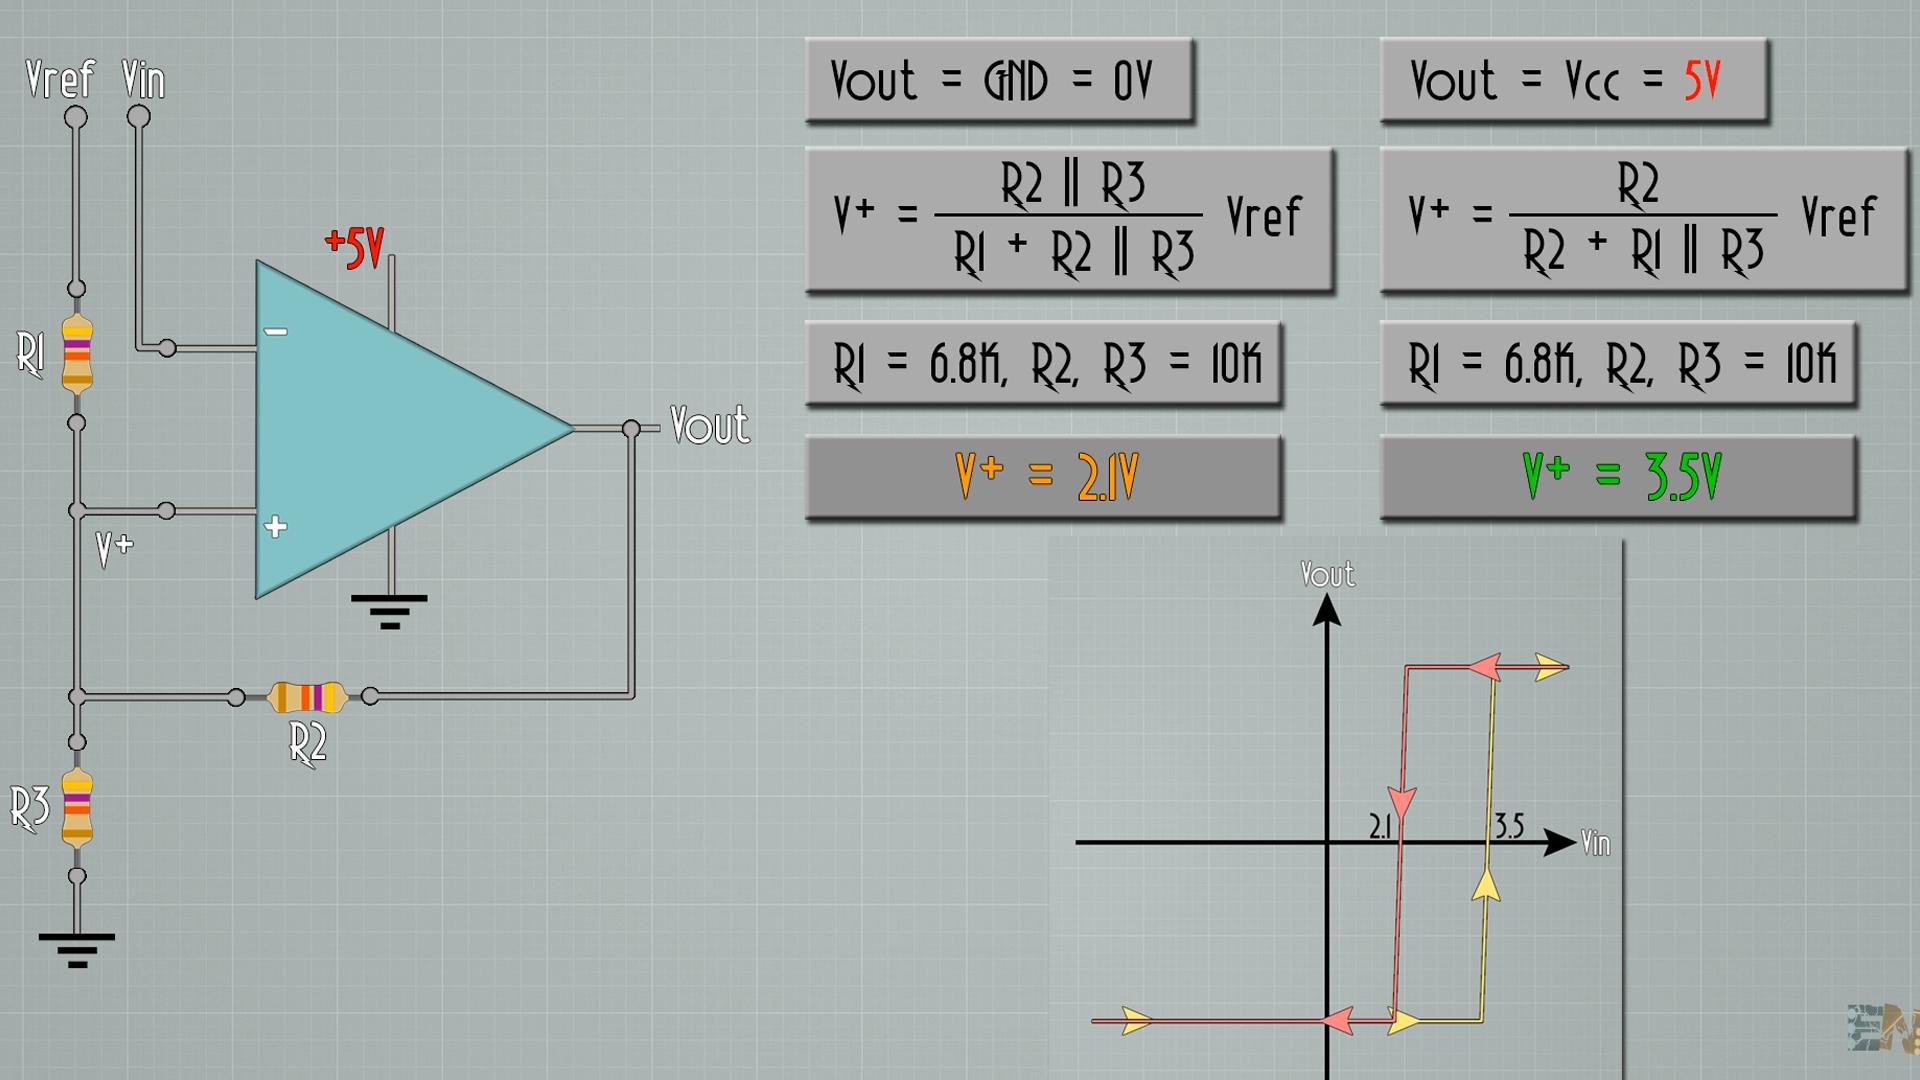 Schmitt Trigger Tutorial With Operational Amplifiers Triangular Waveform Using Opamps